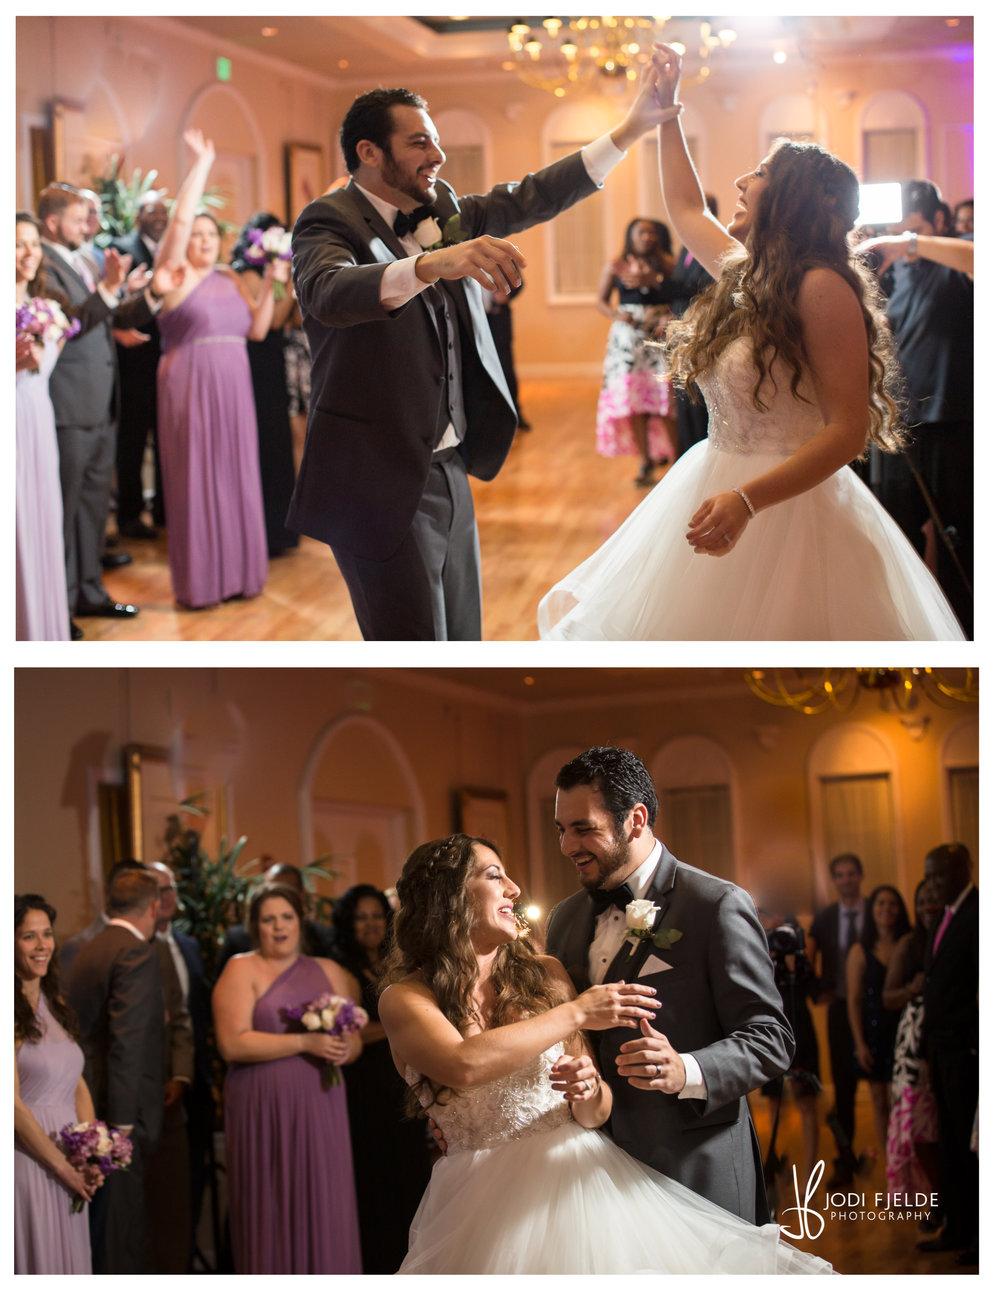 Boynton_Beach_Florida_ Benvenuto_Wedding_Heather__Doug_Married_21.jpg